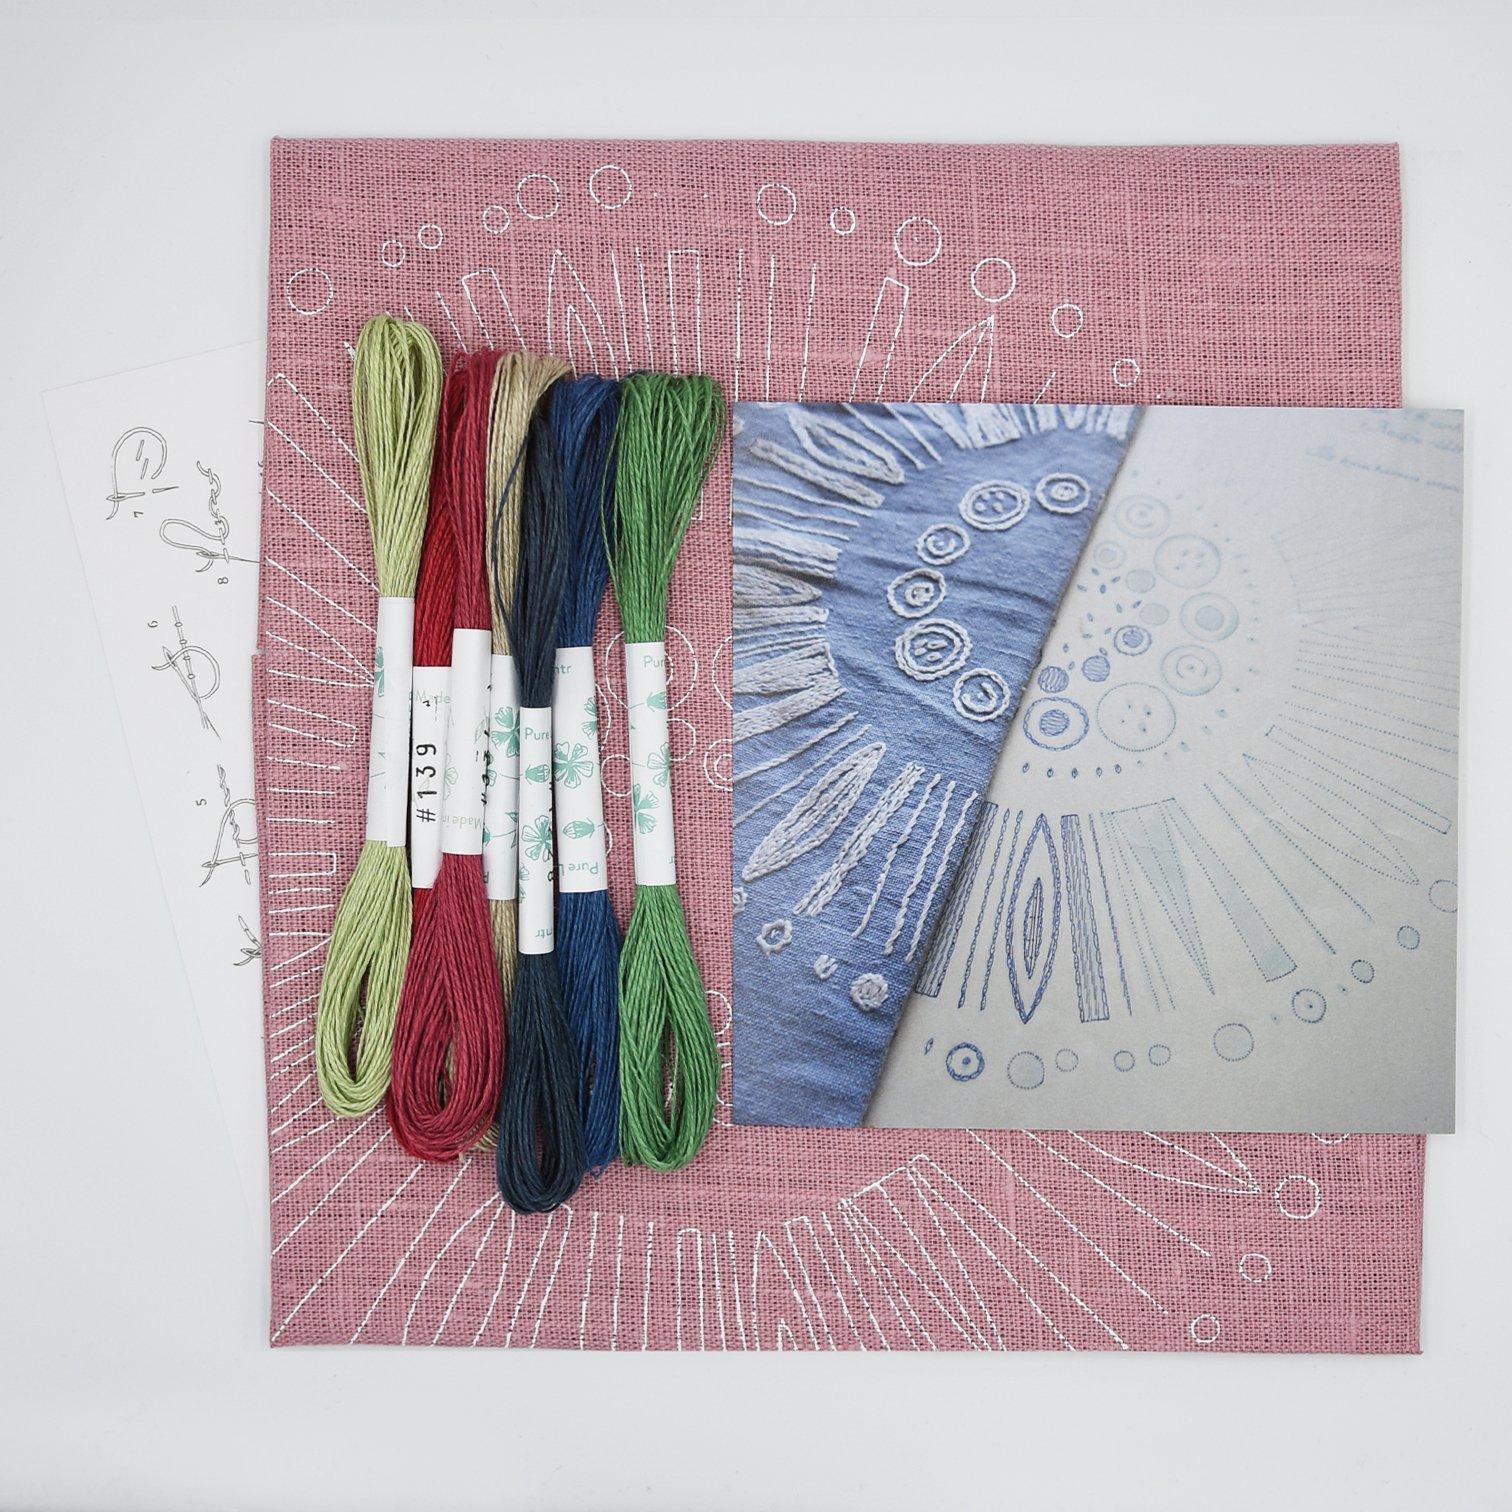 Linladan - Circle 6503 - Swedish Embroidery Kit 44